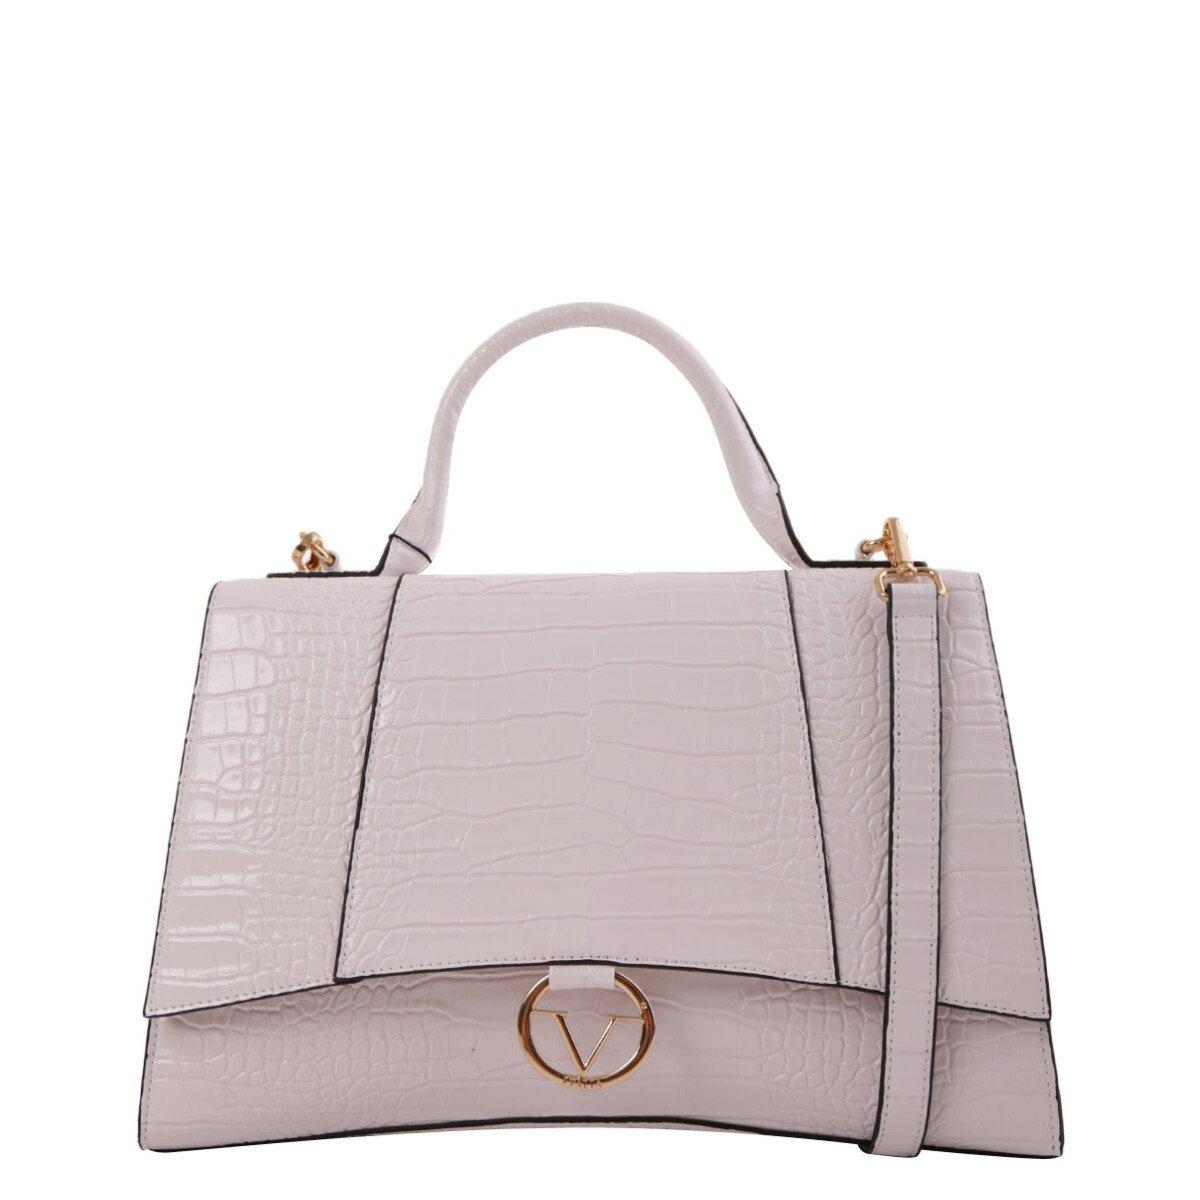 19v69 Italia Women's Handbag Various Colours 319022 - white UNICA